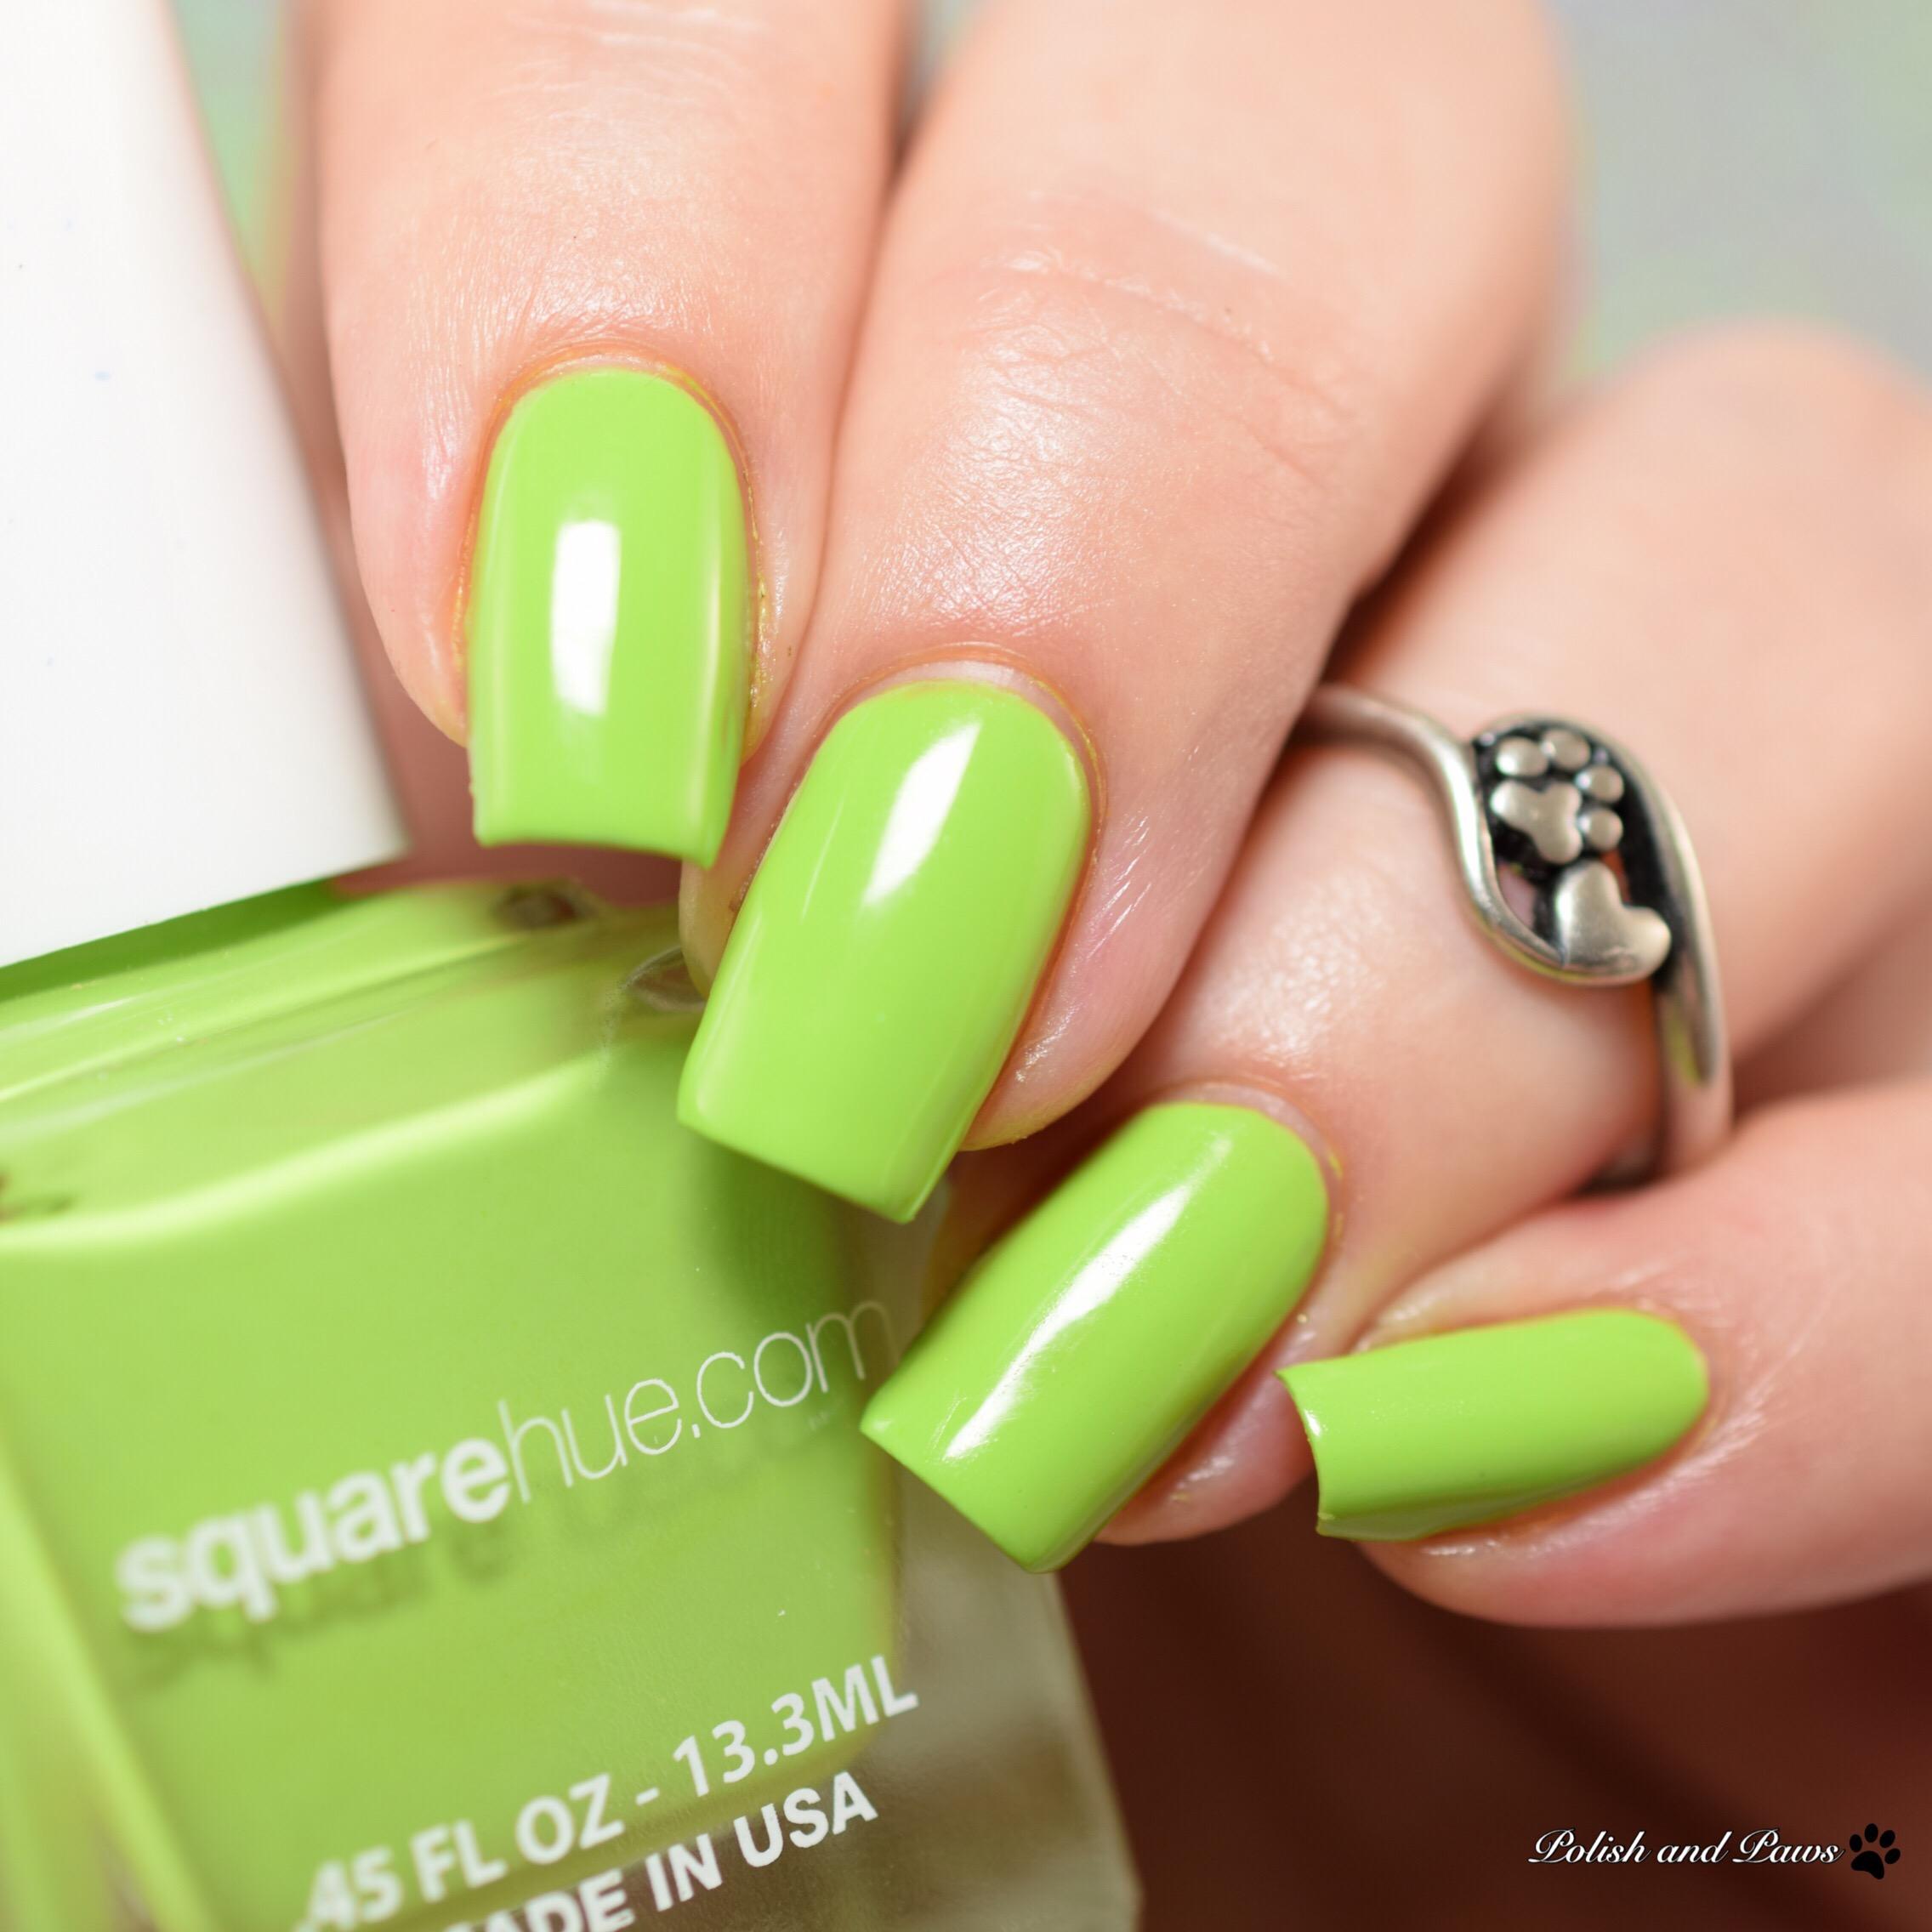 Square Hue Charro